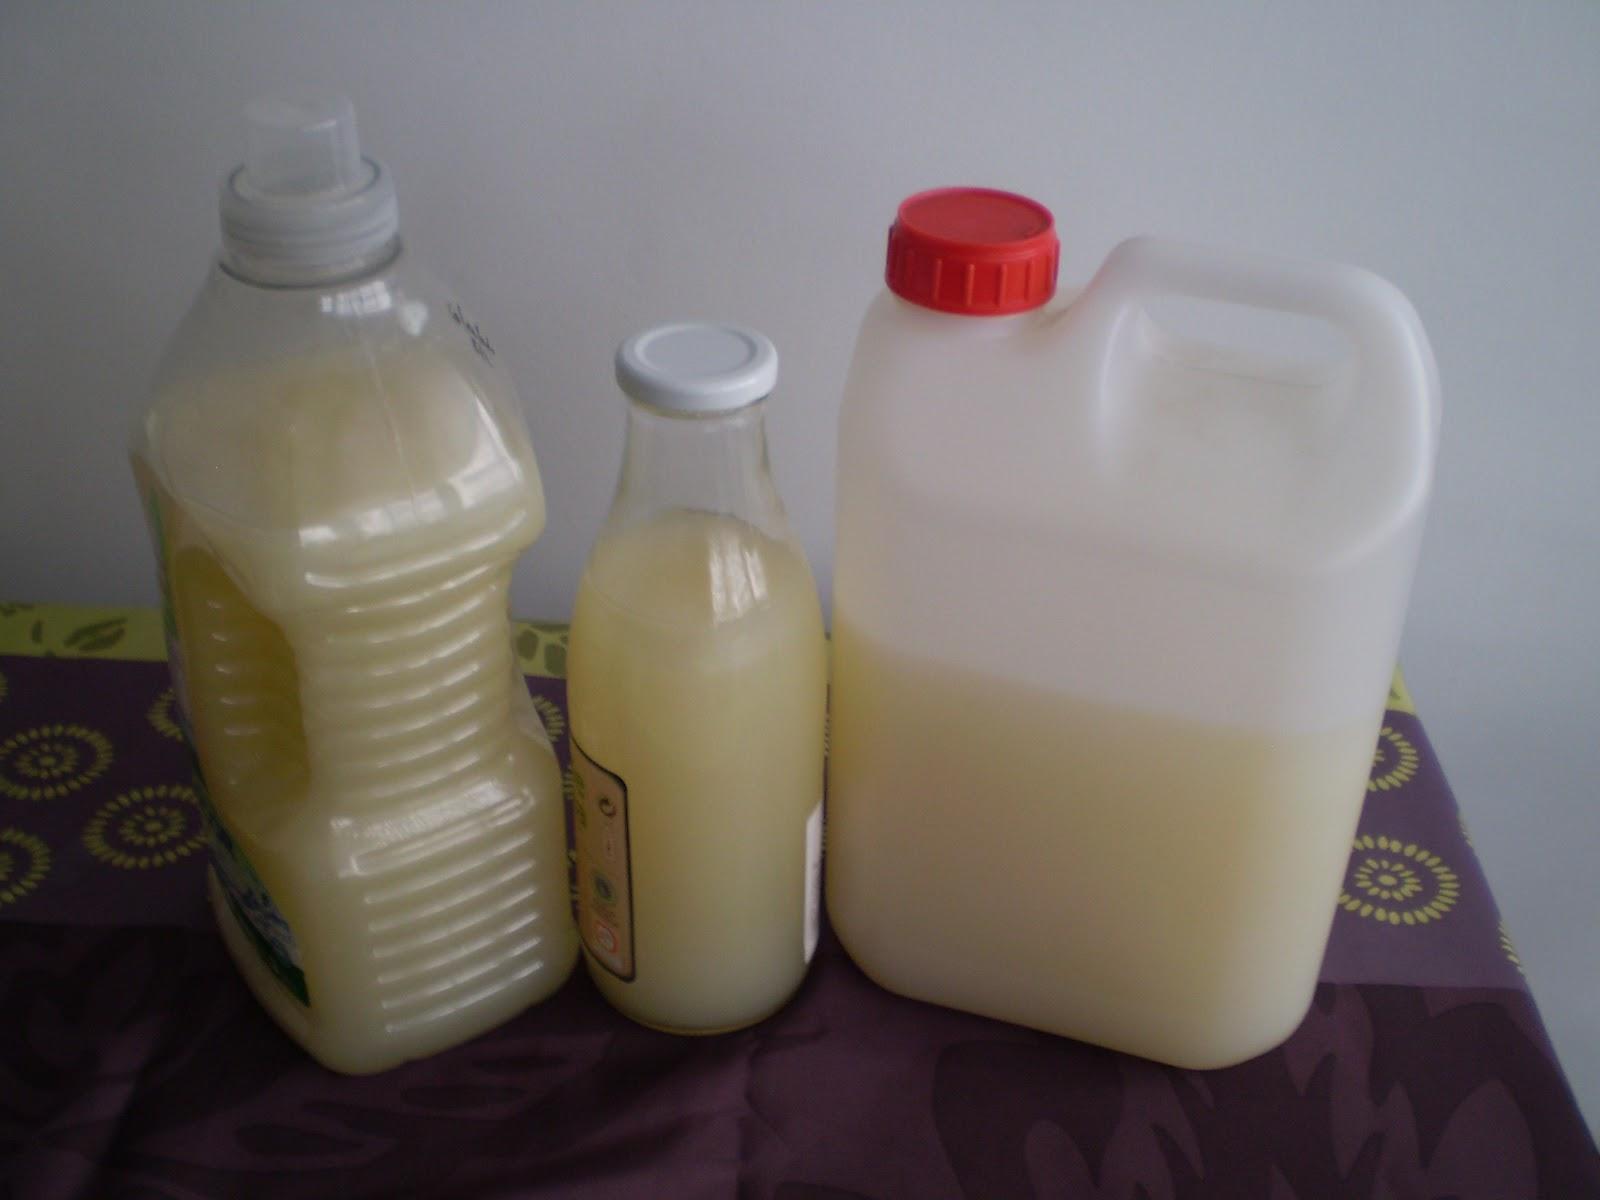 Setem arag n taller de jab n l quido para lavadora - Jabon natural para lavadora ...